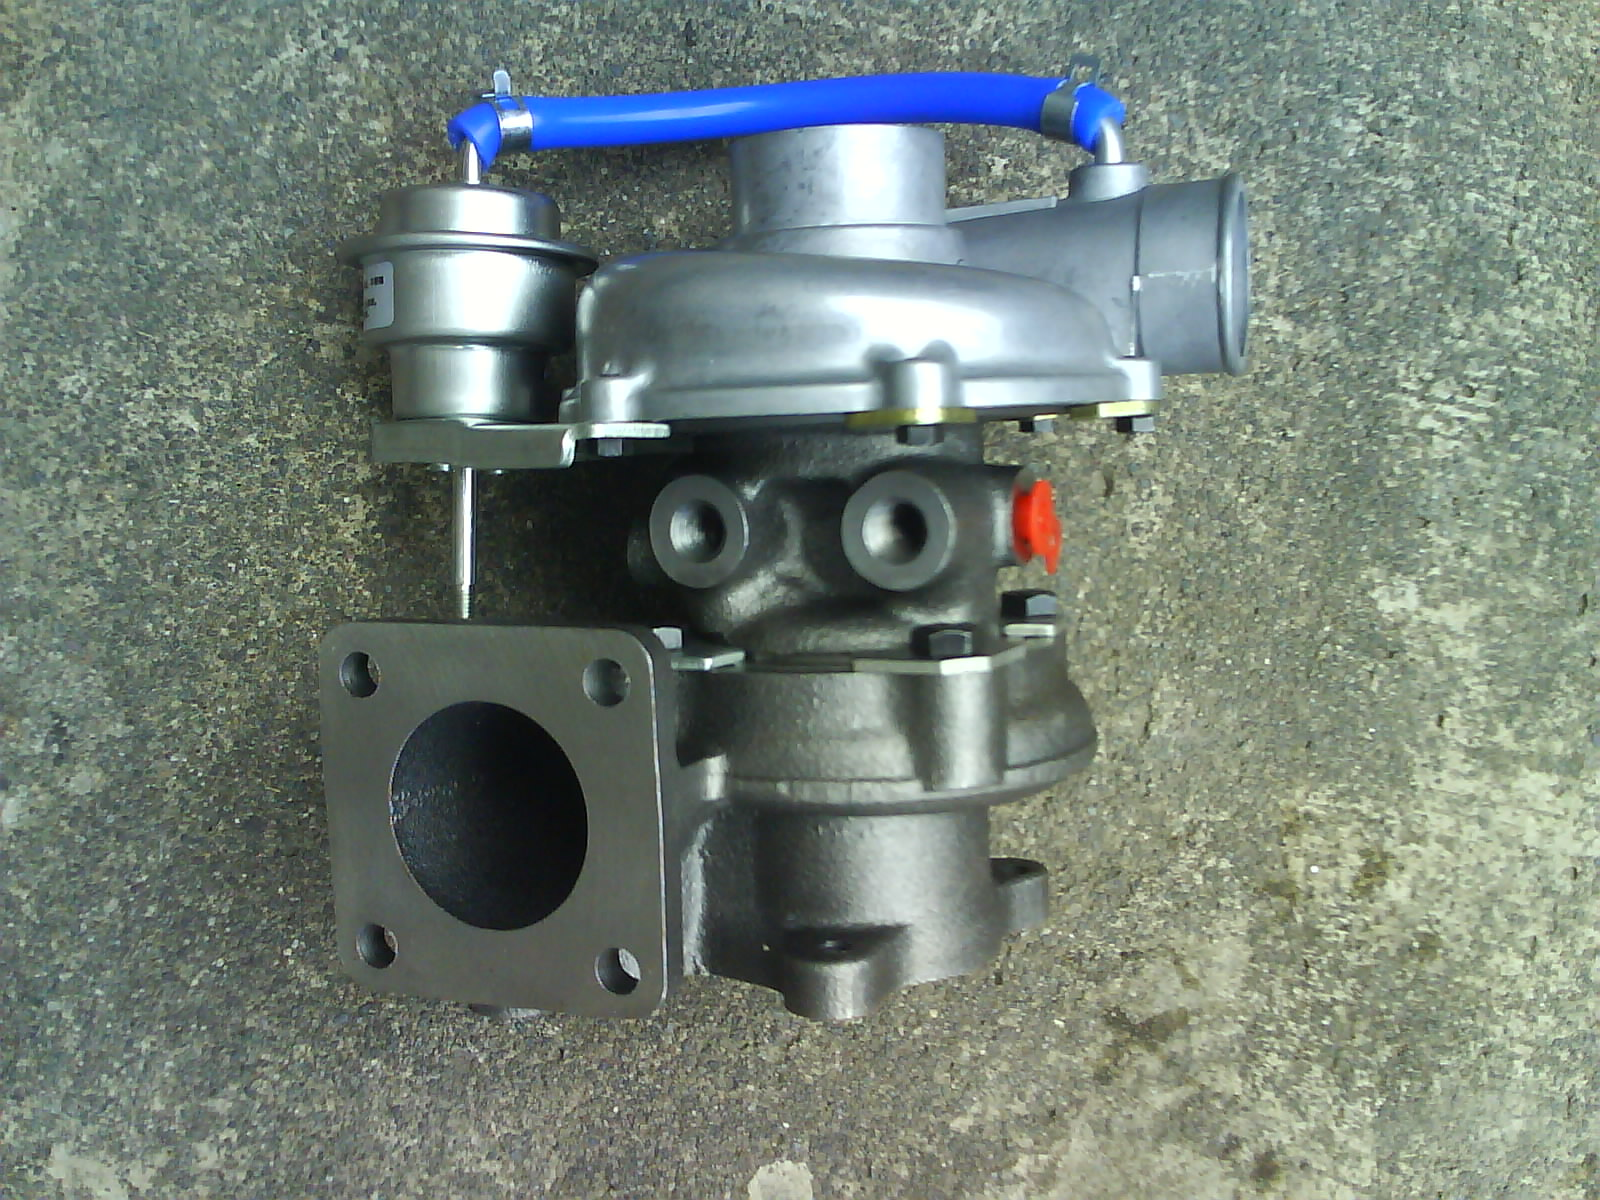 Marcos highway diesel calibration shop isuzu 4jg2 turbocharger replacement